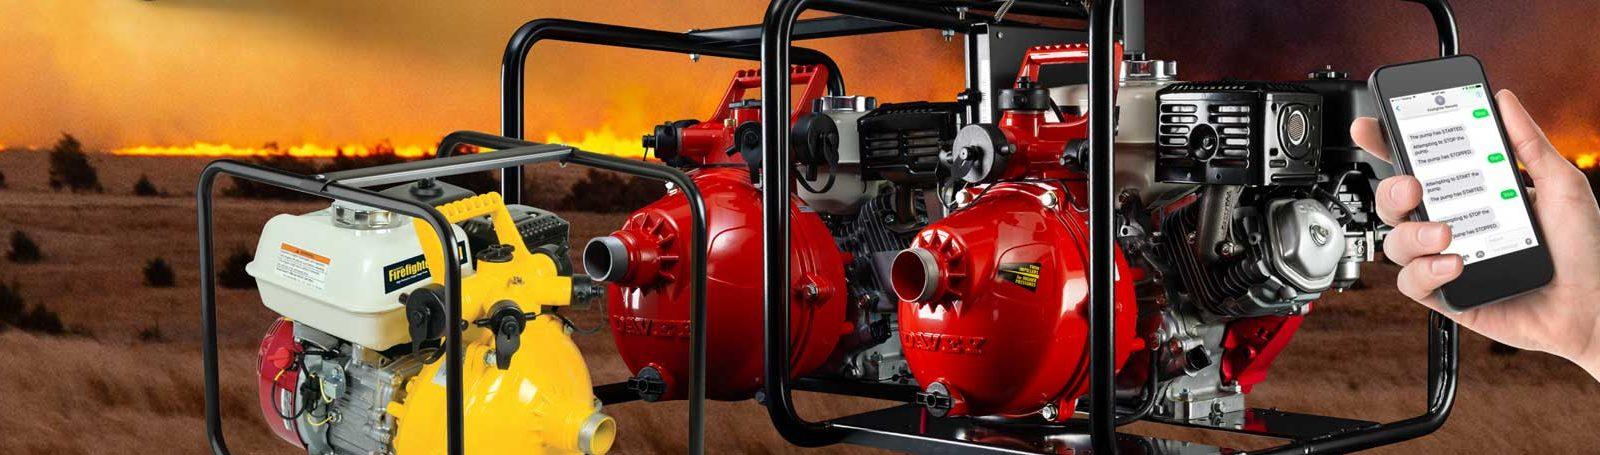 Bushfire-ready-davey-pumps-promo